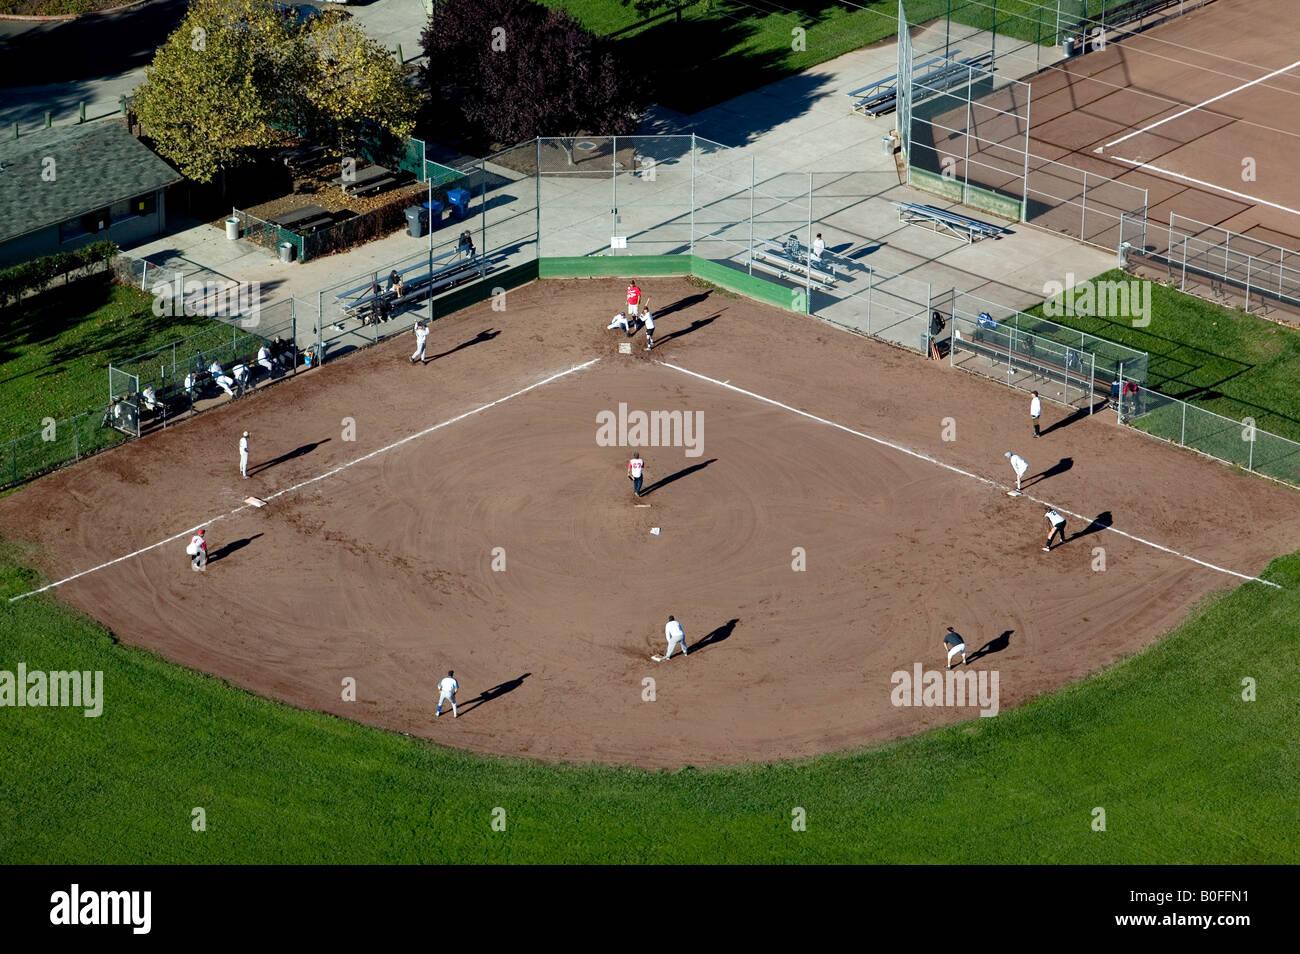 aerial above baseball little league Petaluma, California sports - Stock Image